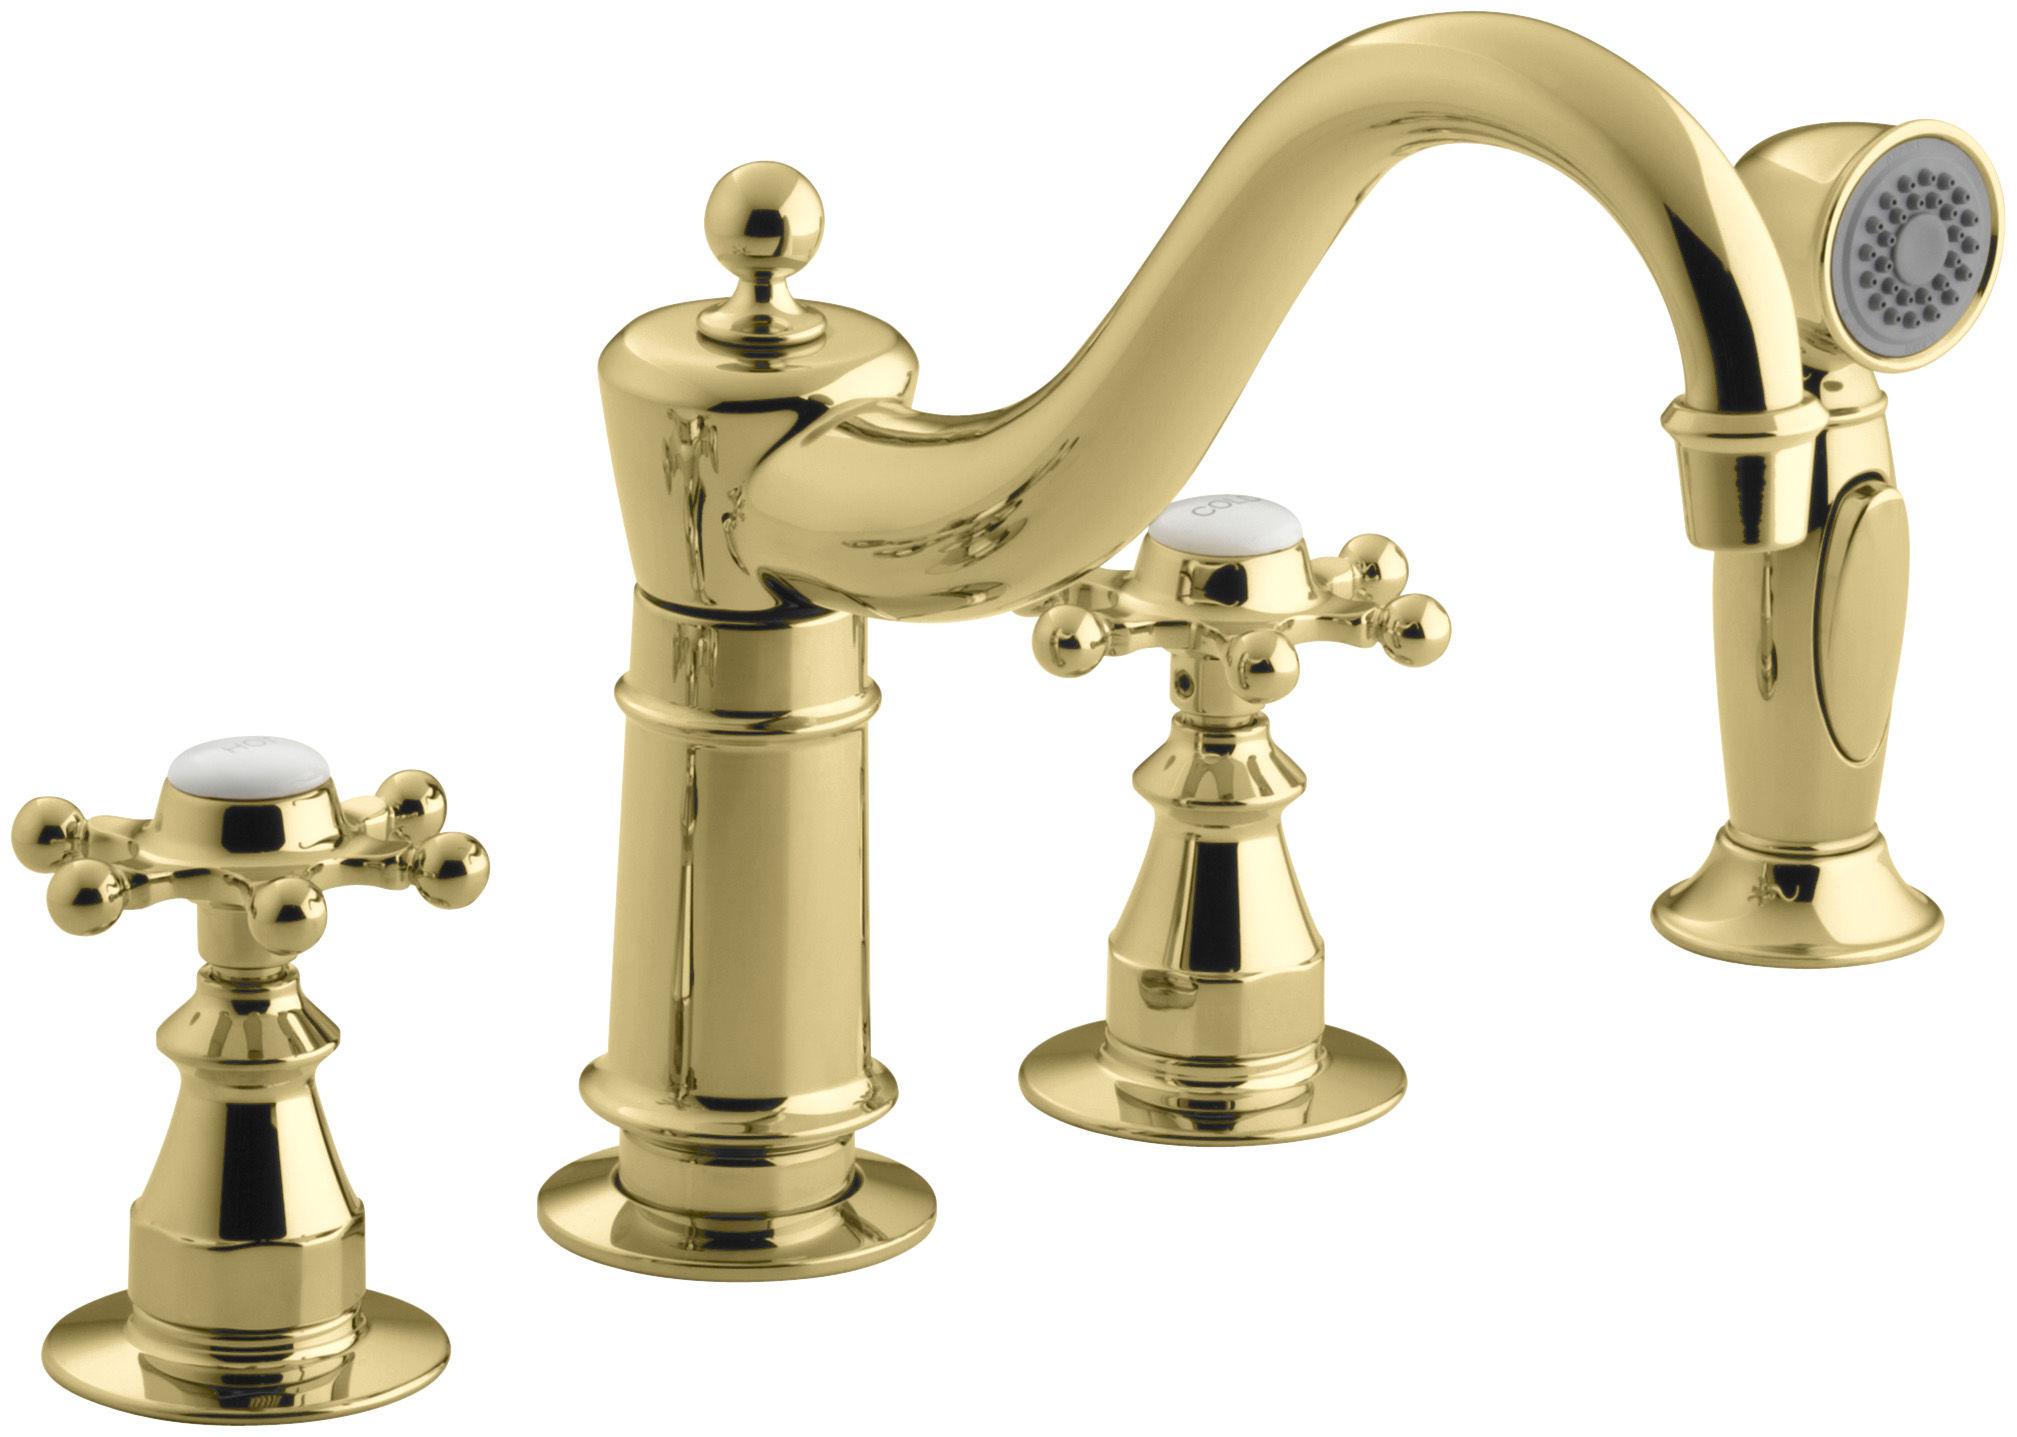 Kohler K-158-3-BN Brushed Nickel Double Handle Kitchen Faucet with ...